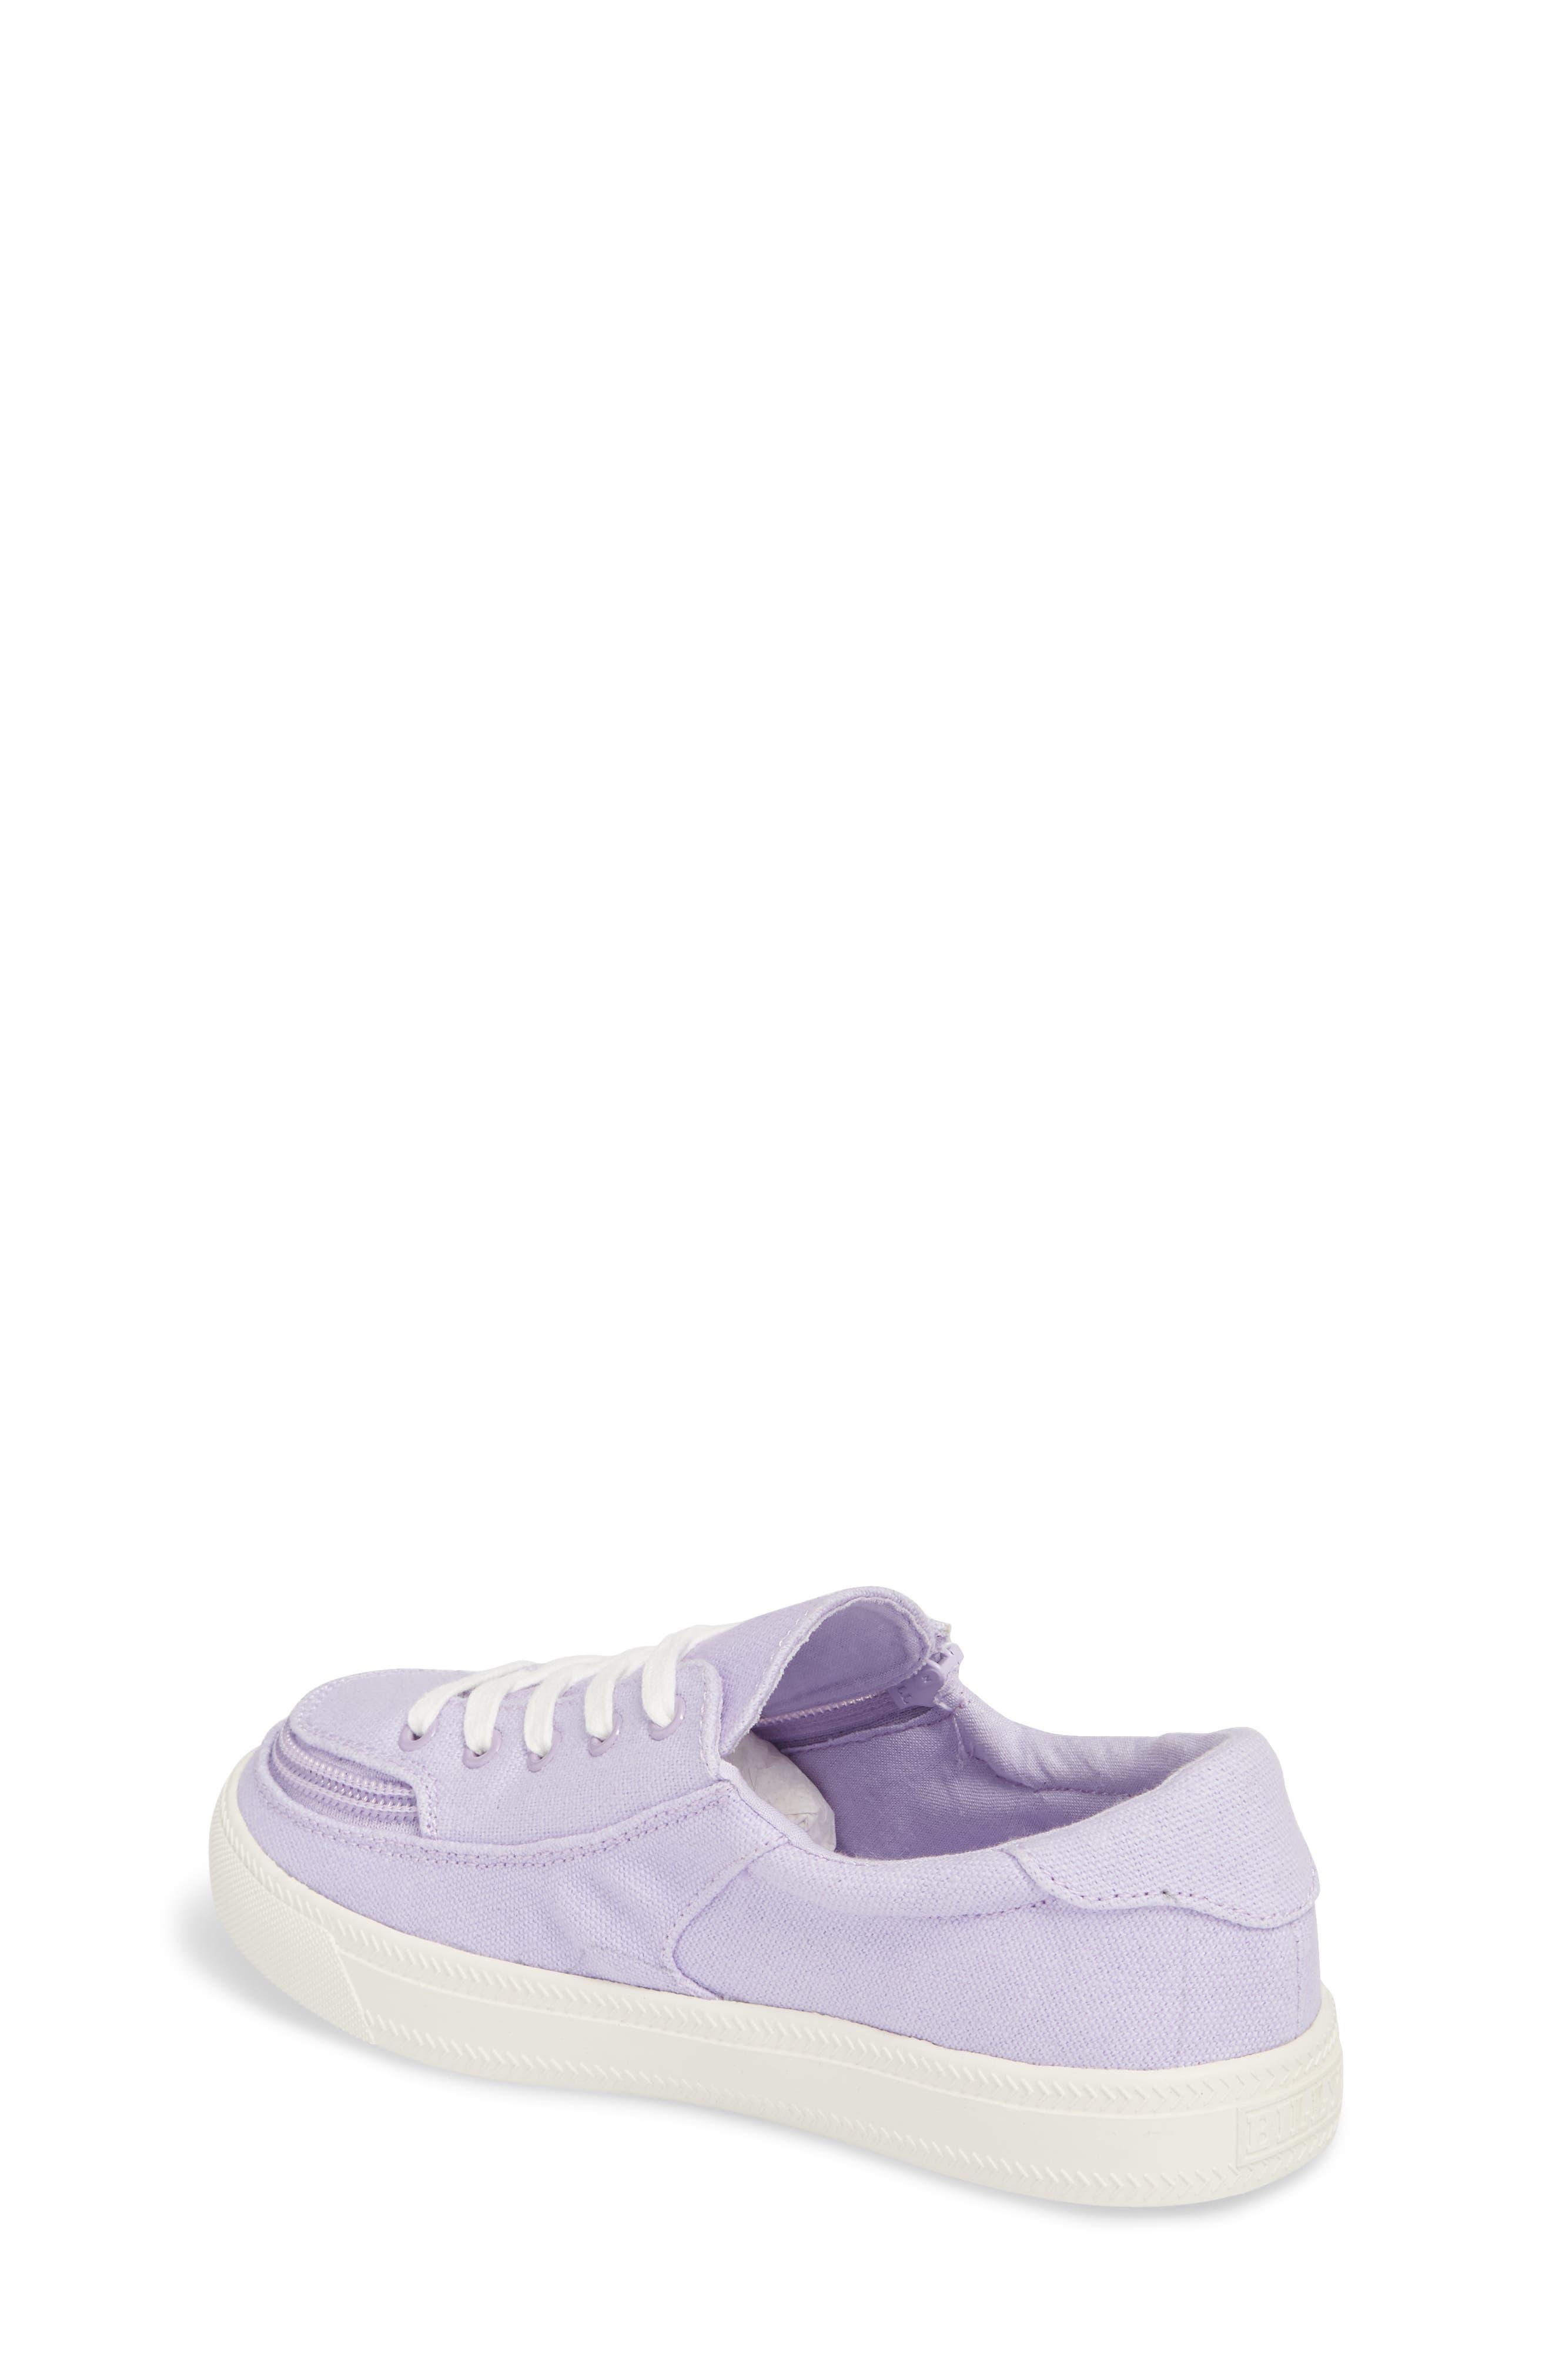 BILLY FOOTWEAR, Classic Zip Around Low Top Sneaker, Alternate thumbnail 2, color, LAVENDER